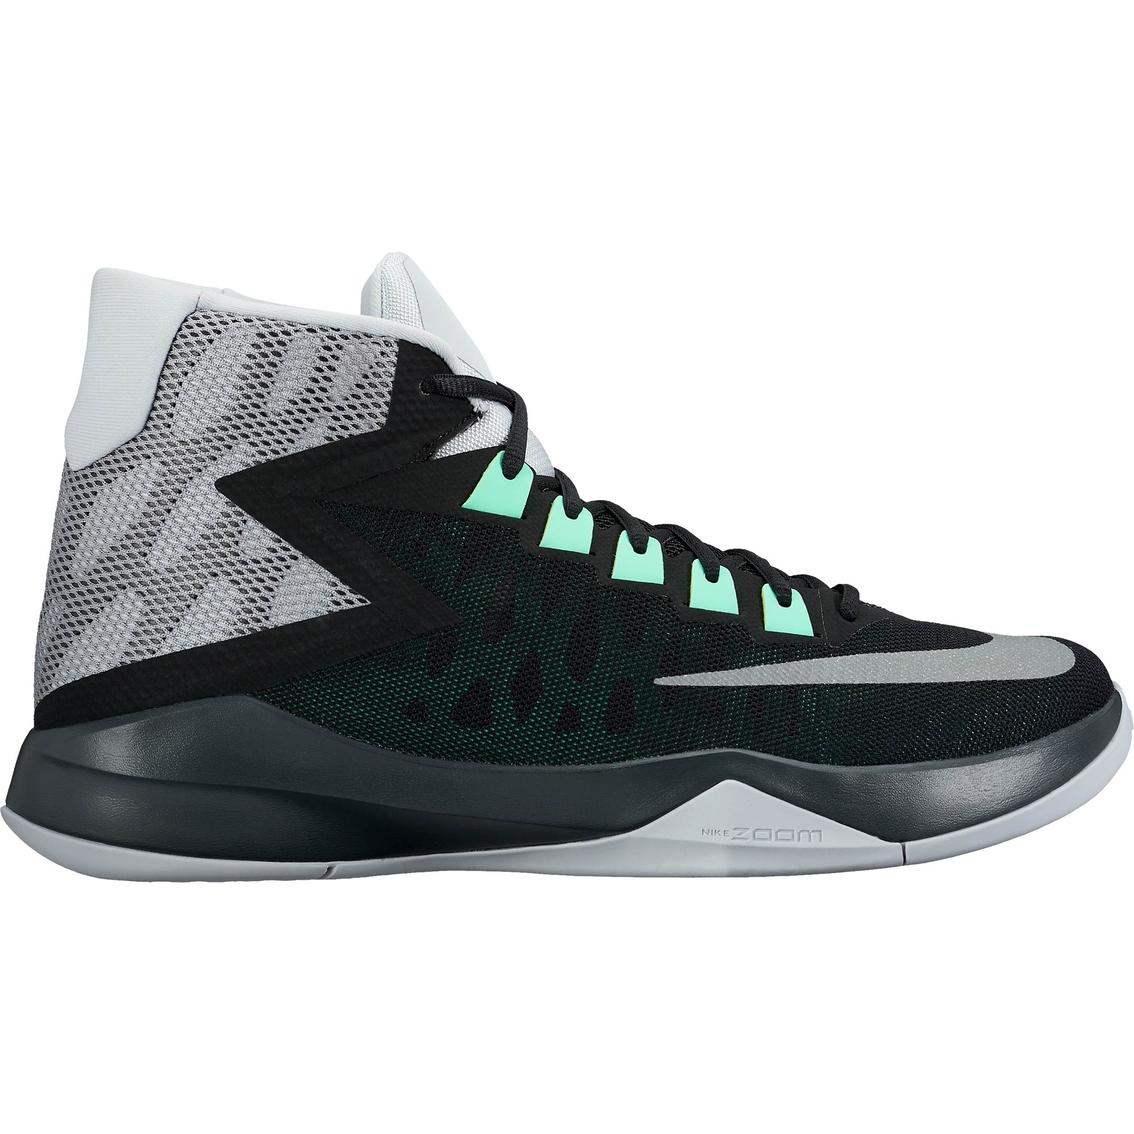 a4dff58c5bf Nike Men s Zoom Devosion Basketball Shoes